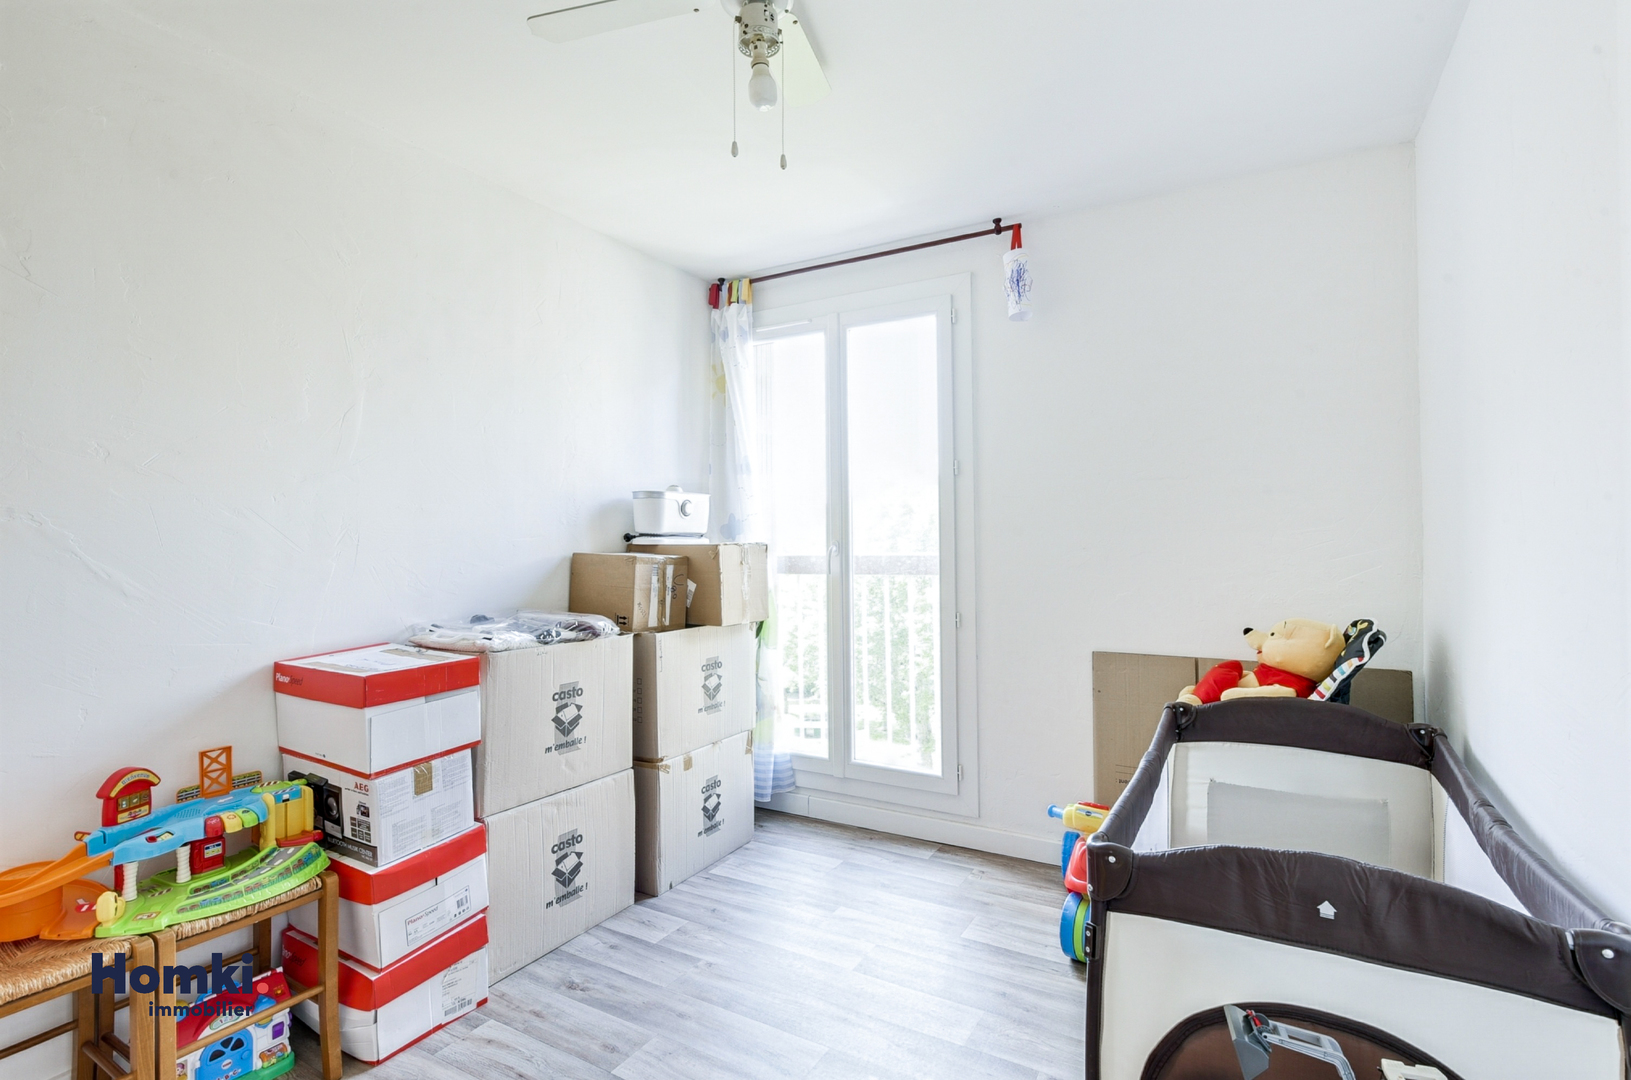 Vente appartement MArseille 13010 T5_10